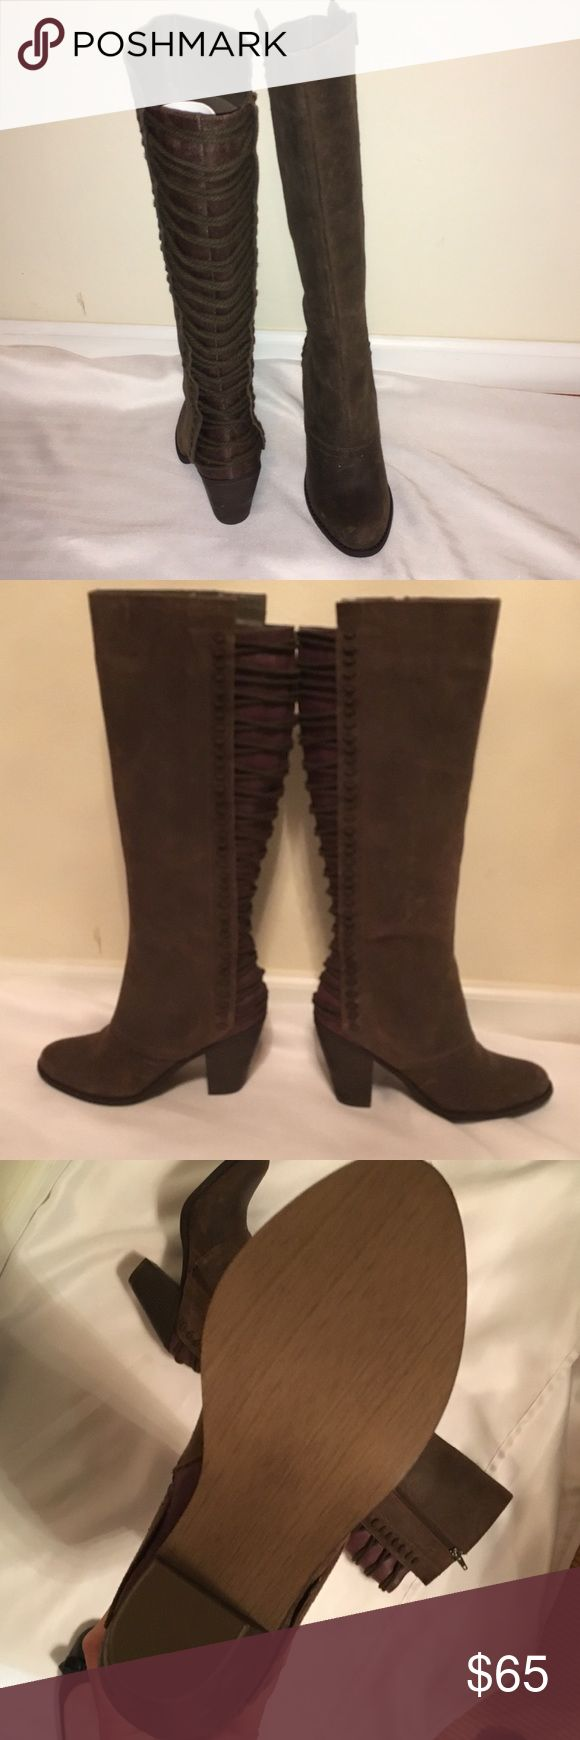 "NEW Carlos Santana boots Distressed brown leather Carlos Santana boots.  New never worn.  Smoke free, pet free home.  Heel approx 3 1/2"" Carlos Santana Shoes Heeled Boots"